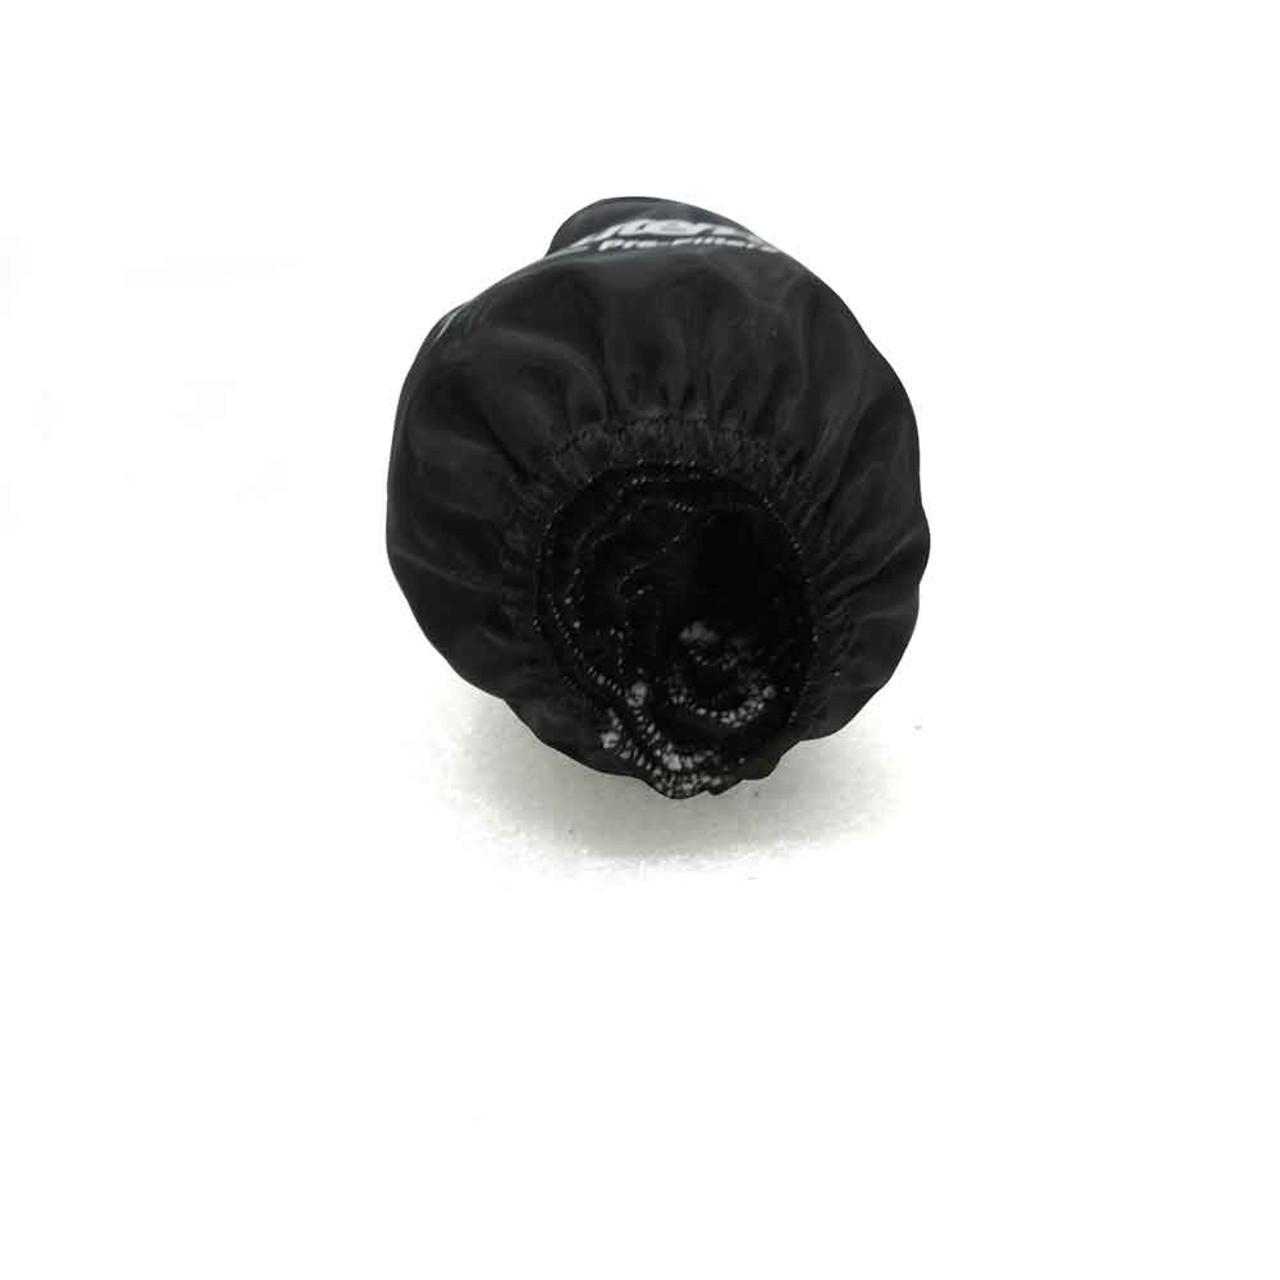 "Outerwears Prefilter, 3"" x 4"" (Black)"